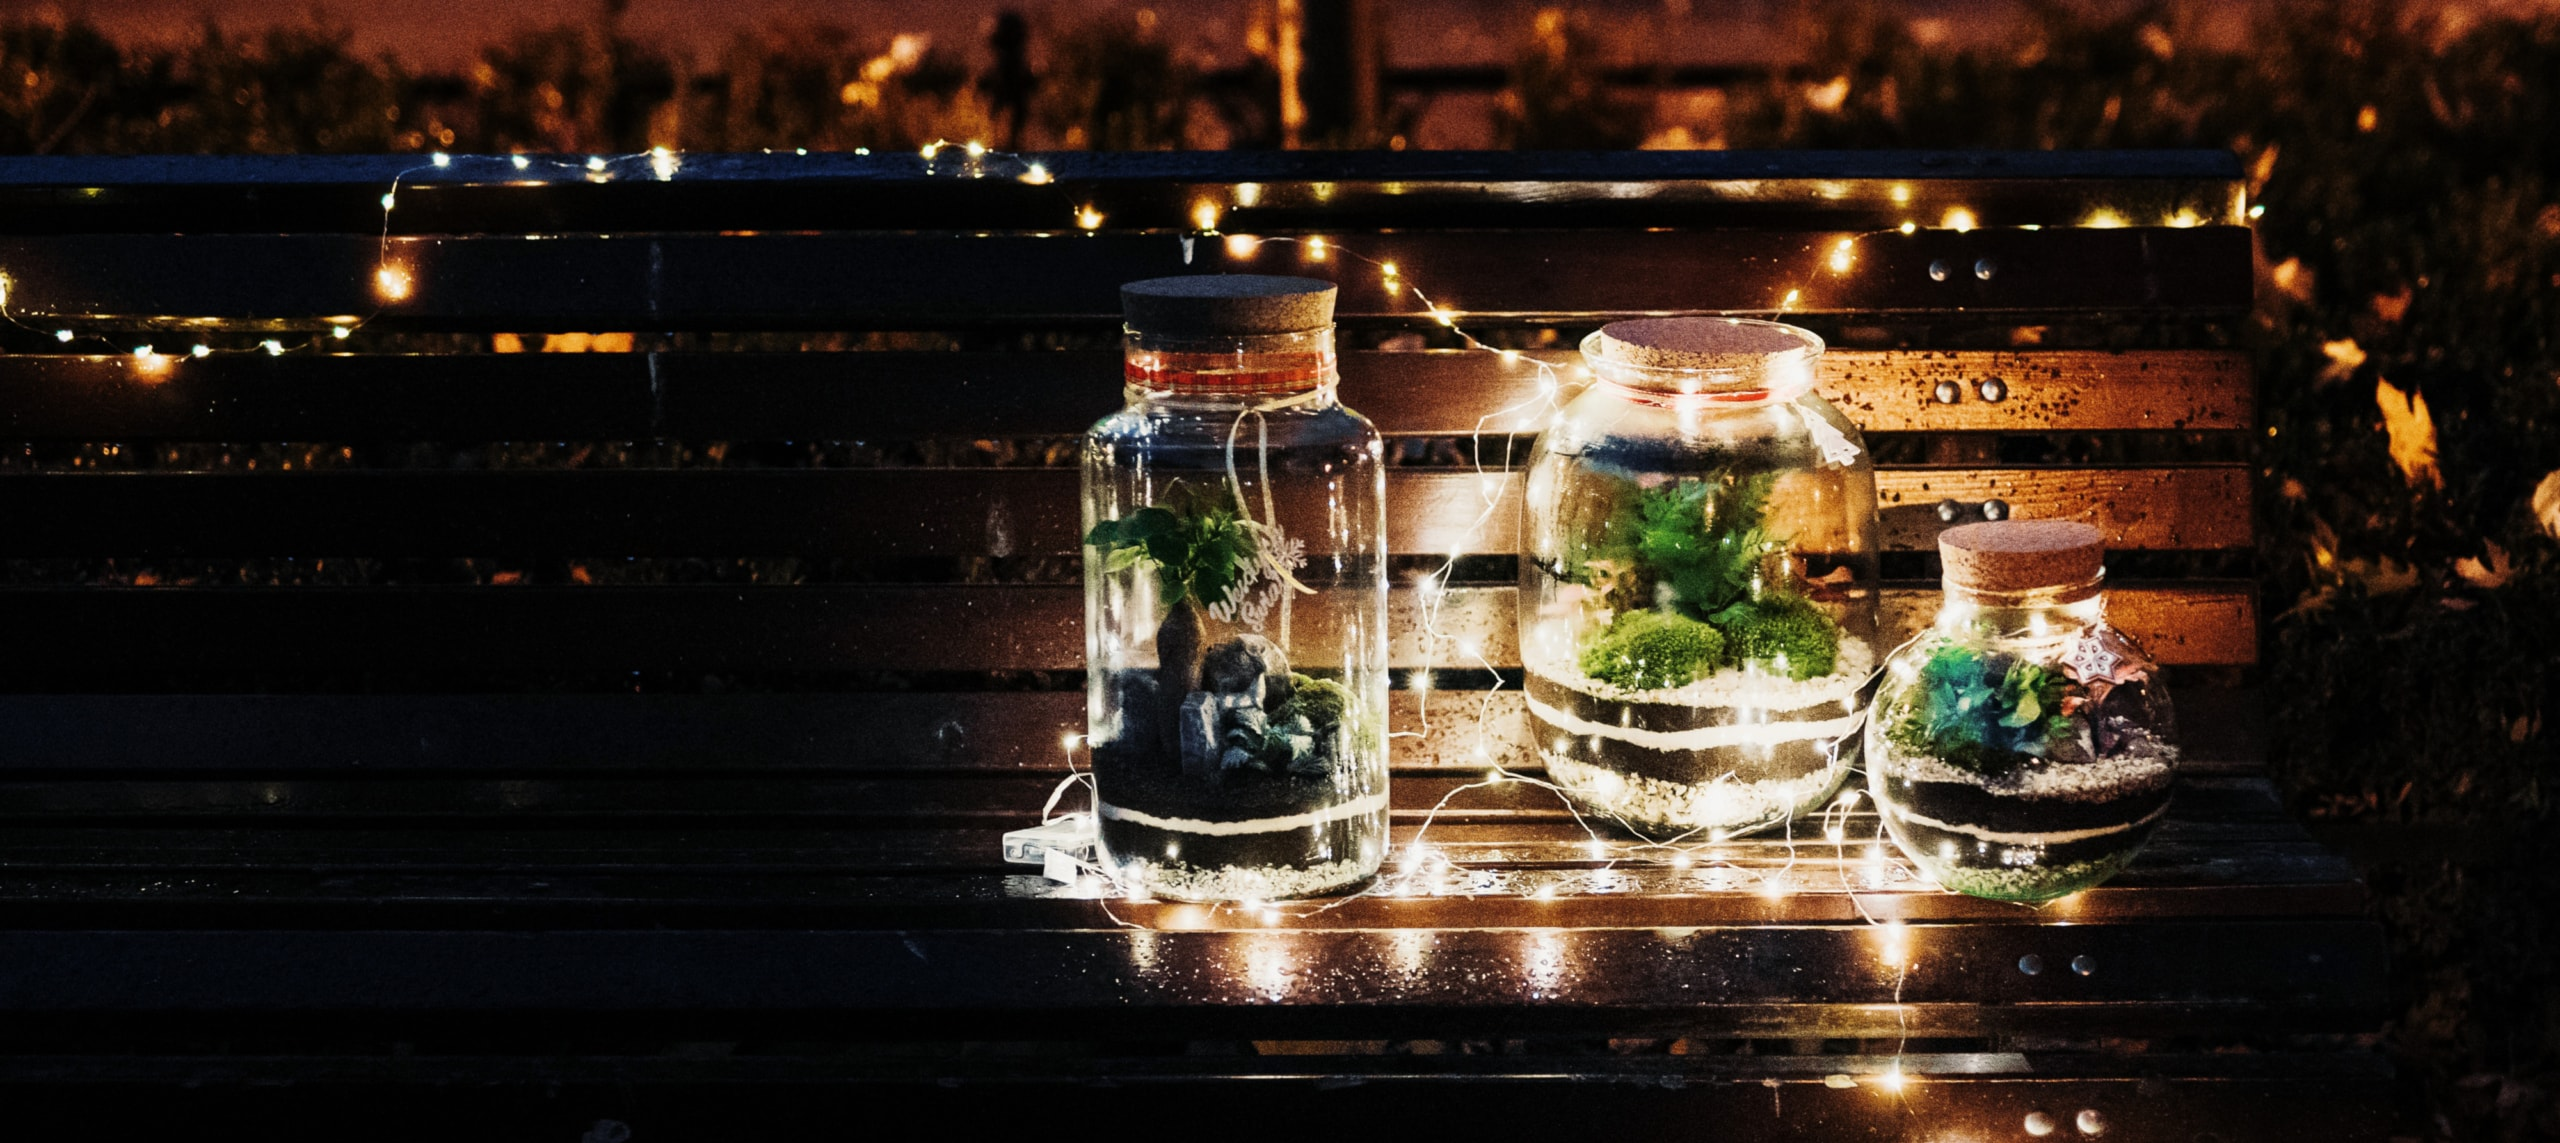 las w słoiku - kolekcja świąteczna